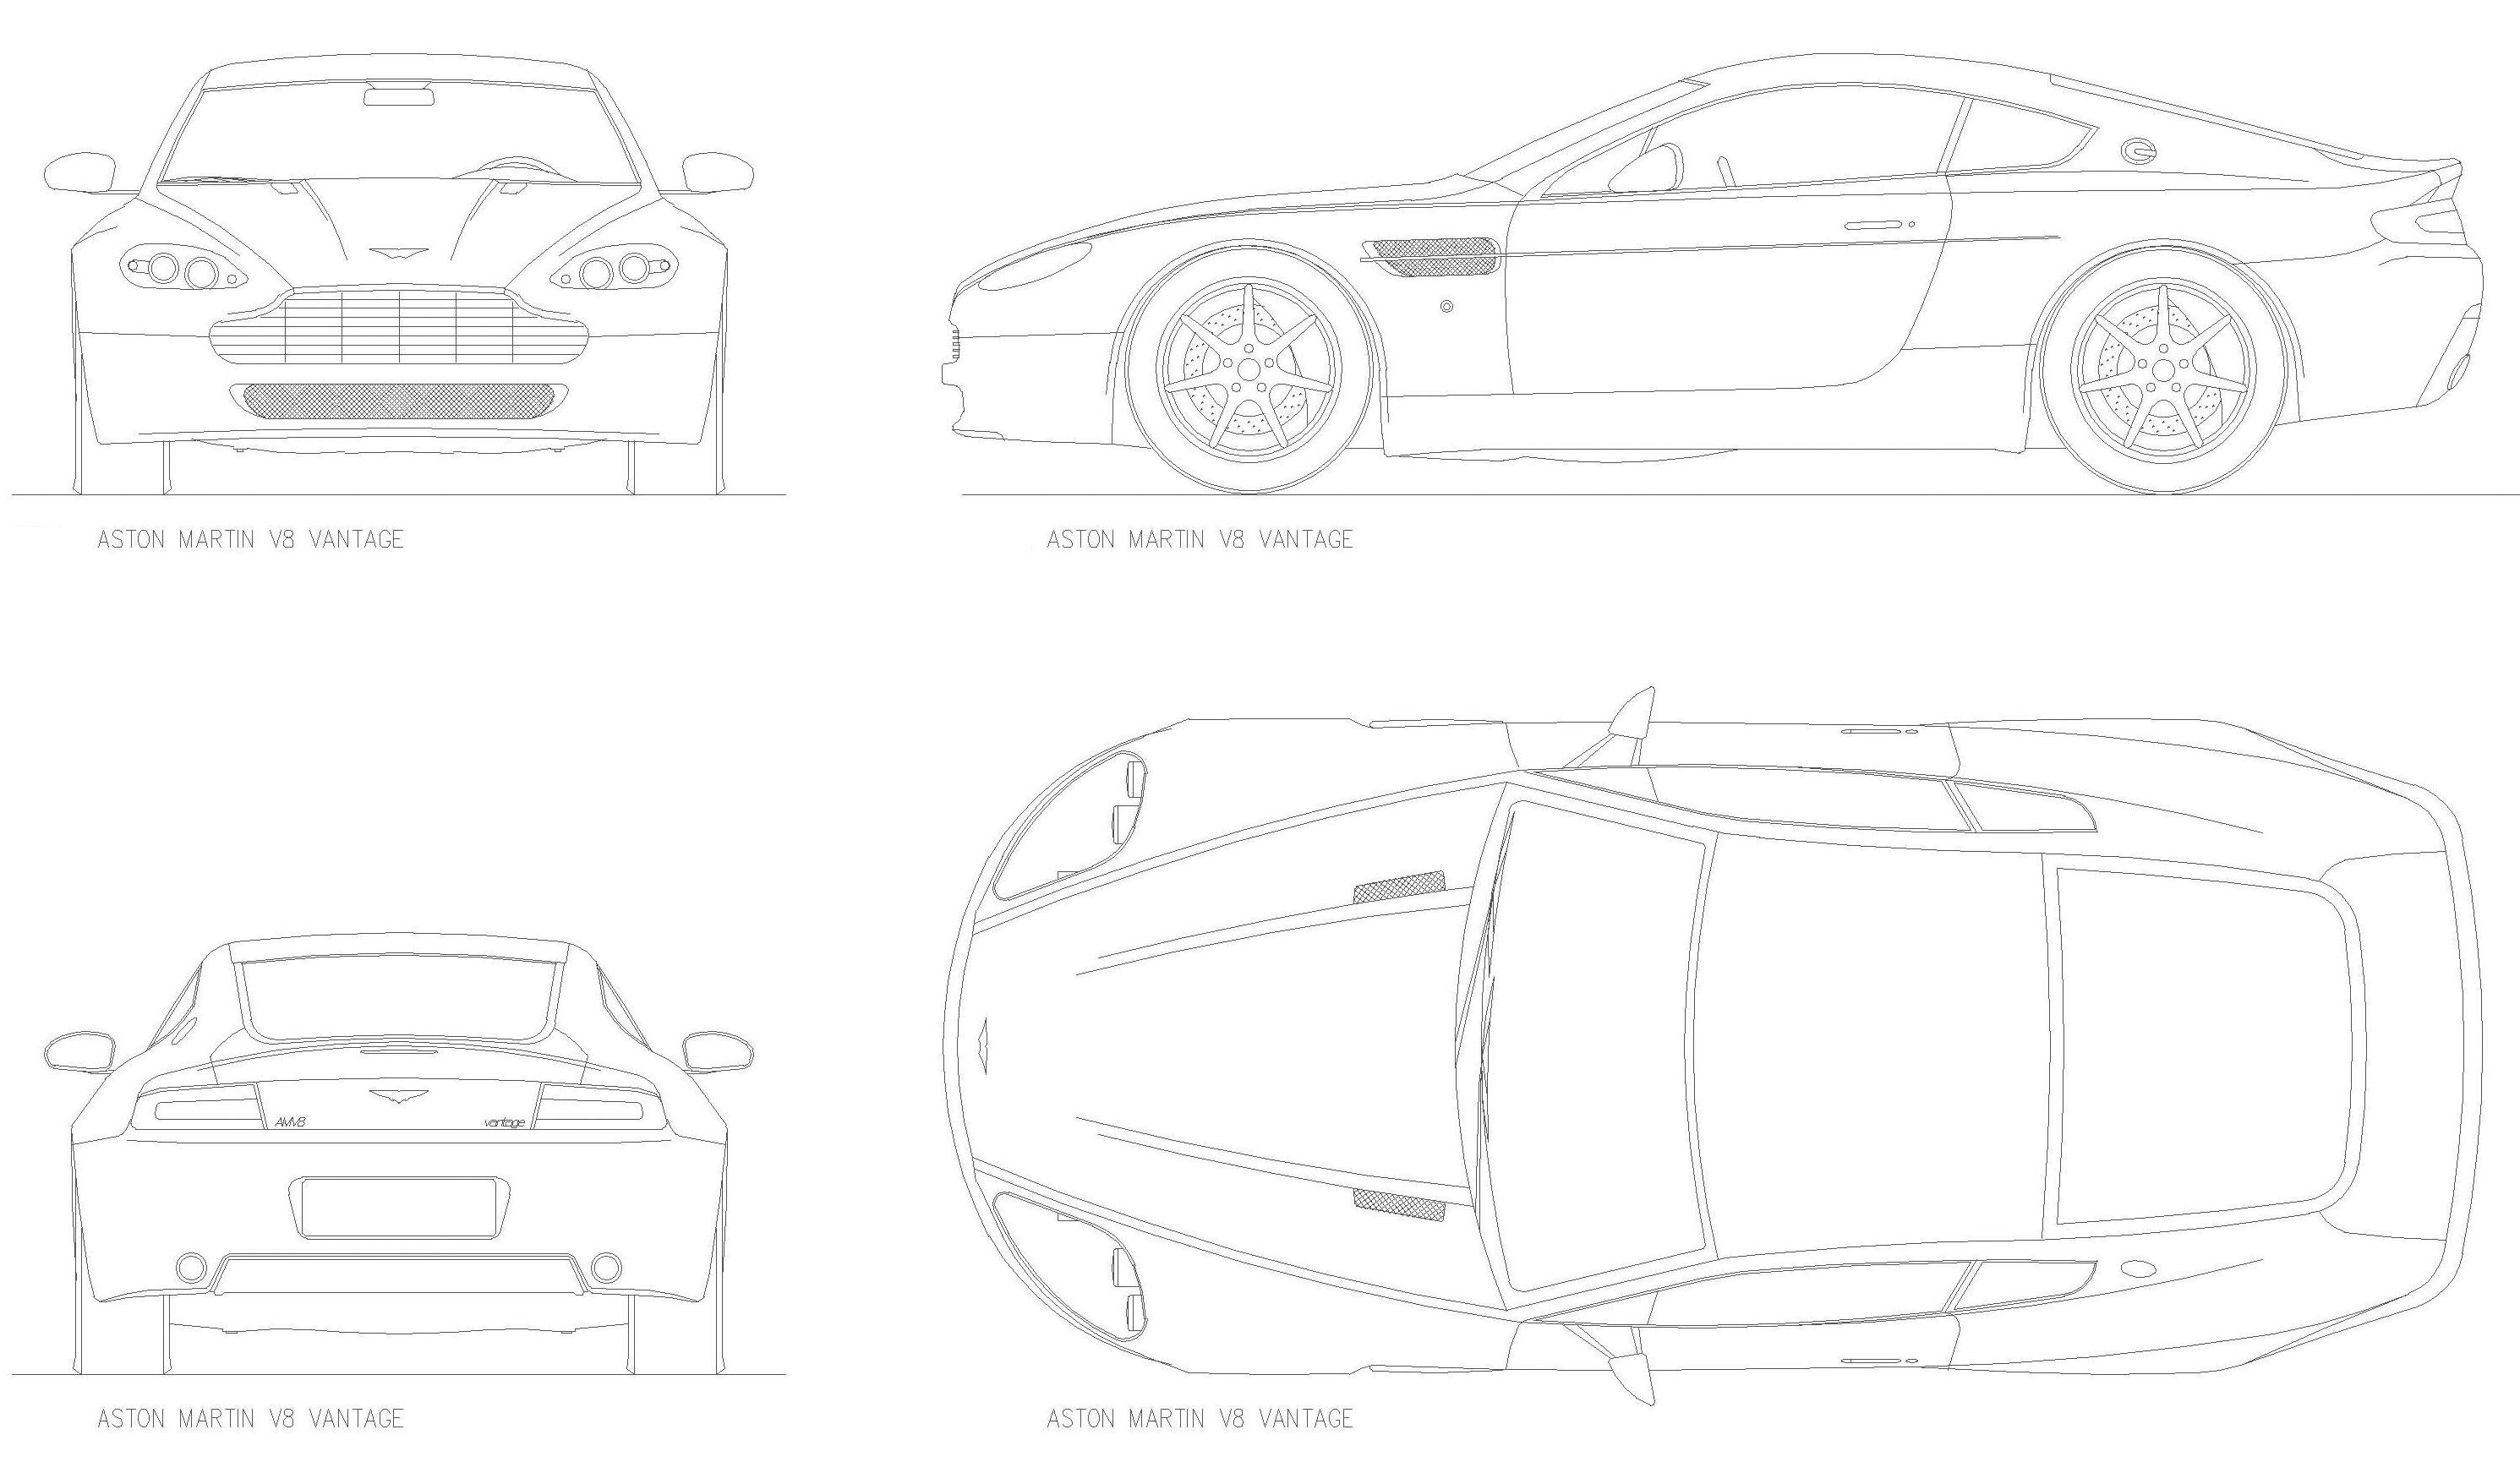 Aston Martin V8 Vantage Coupe Blueprints Free